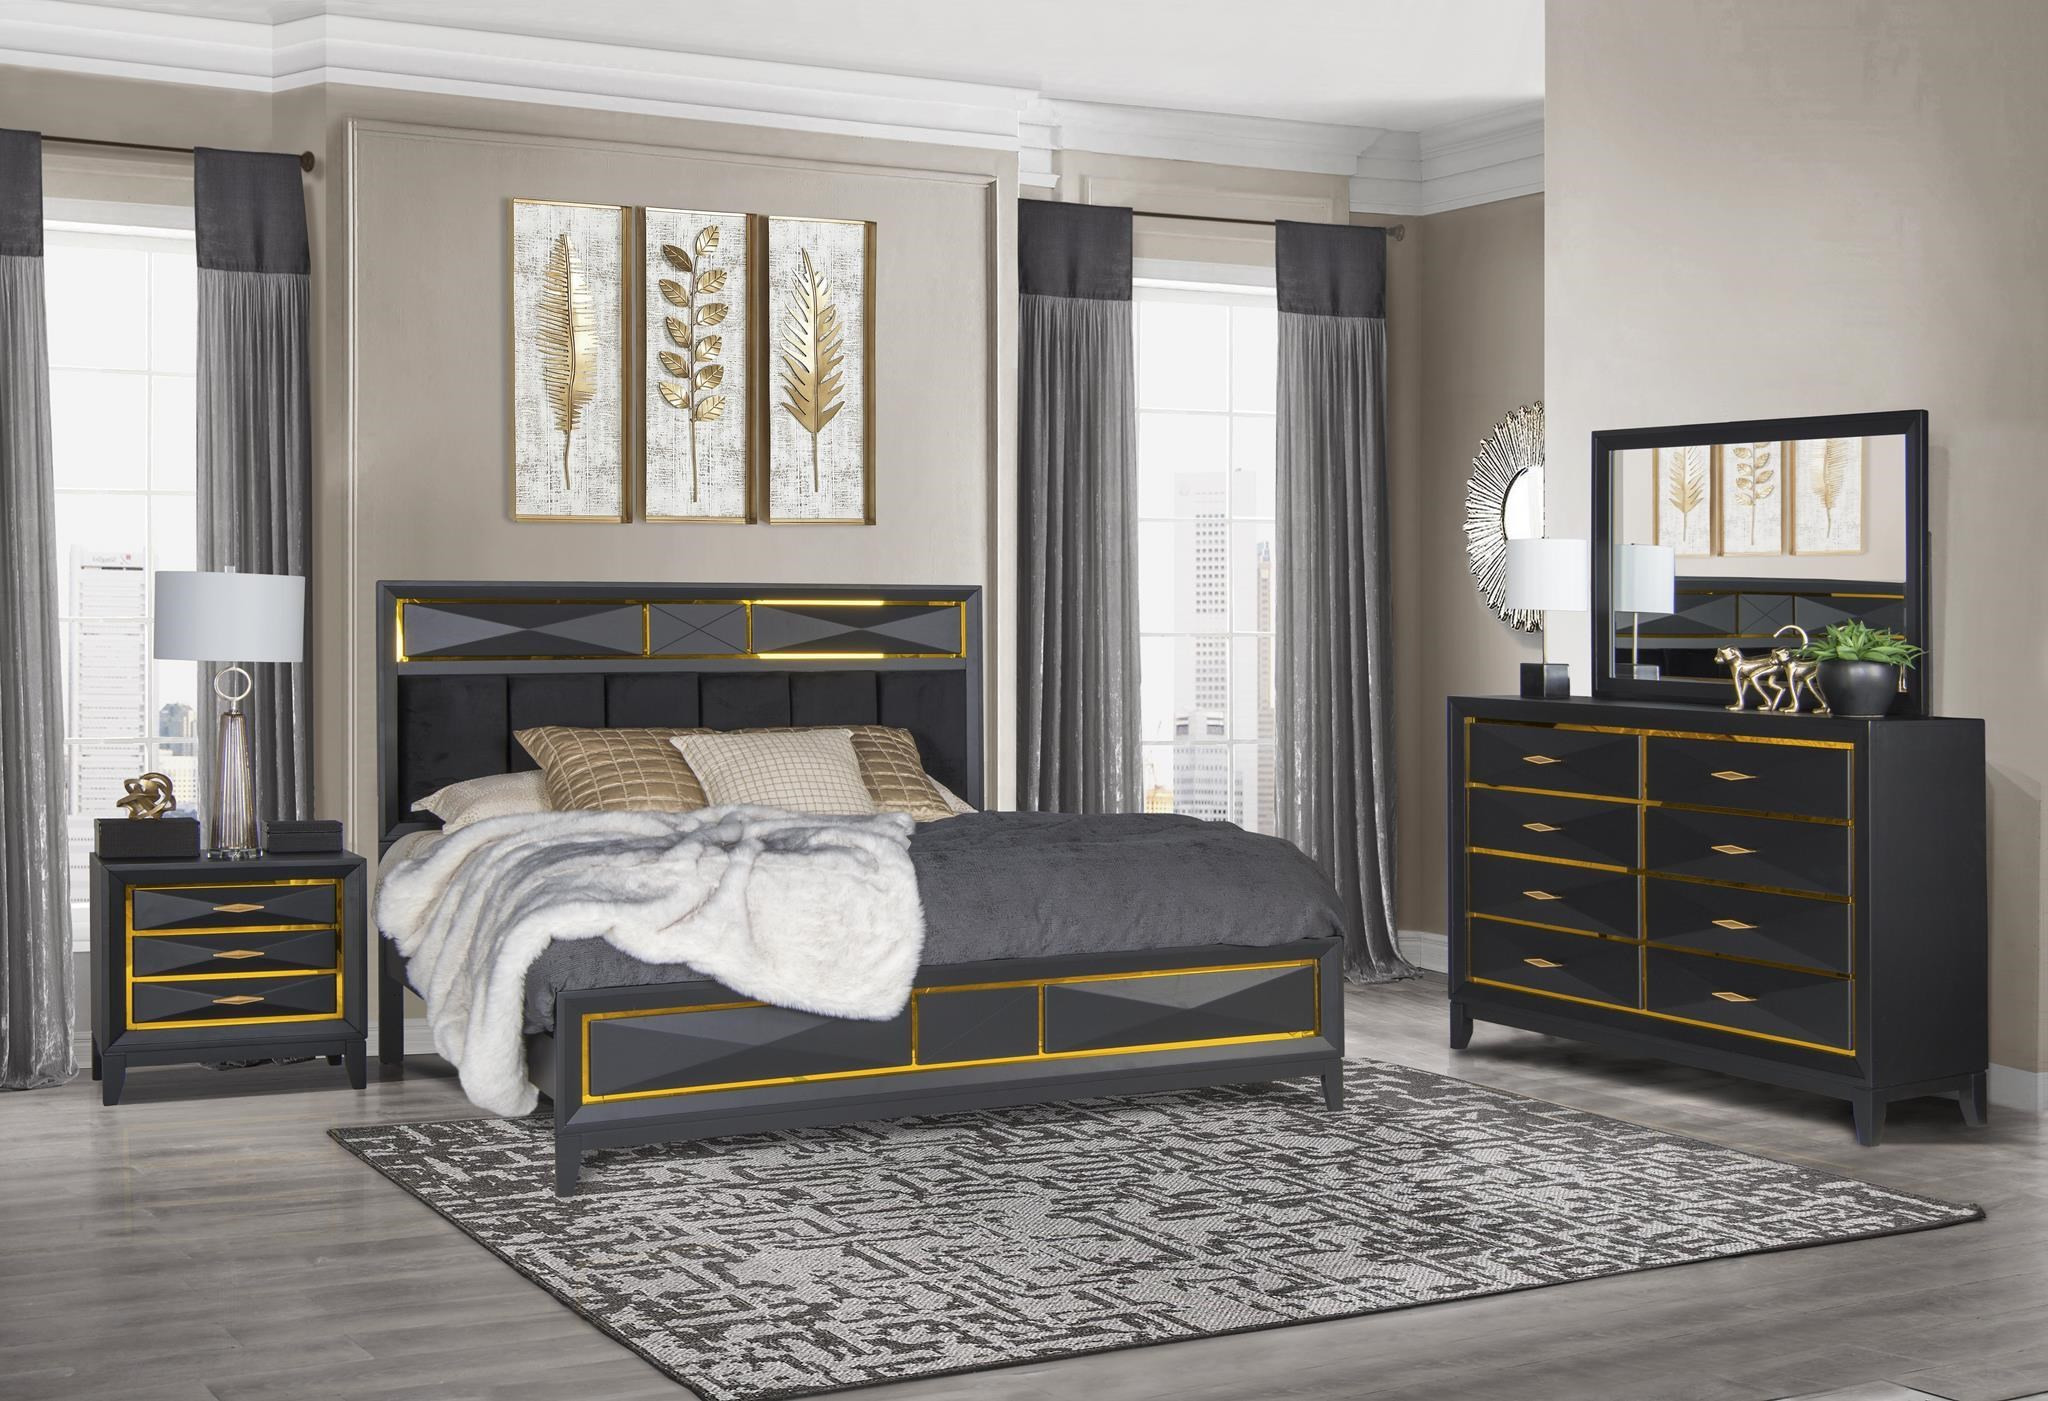 Enzo 4PC King Bedroom Set at Rotmans